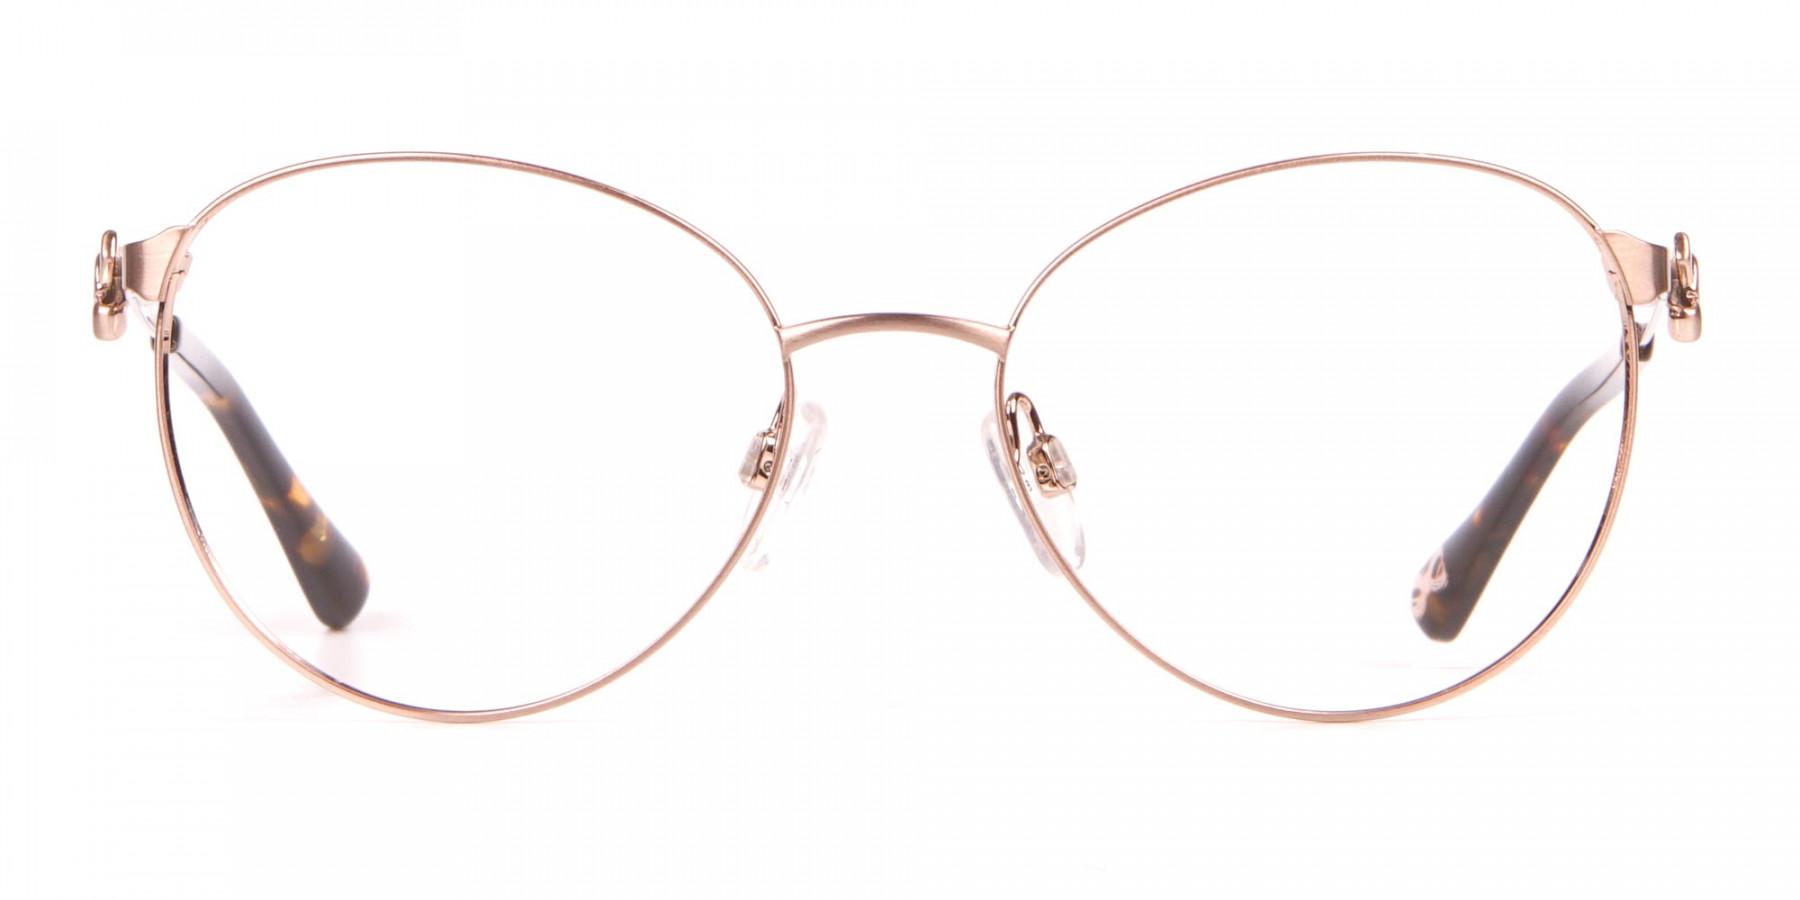 Ted Baker TB2243 Elvie Gold Round Metal Glasses Women-1